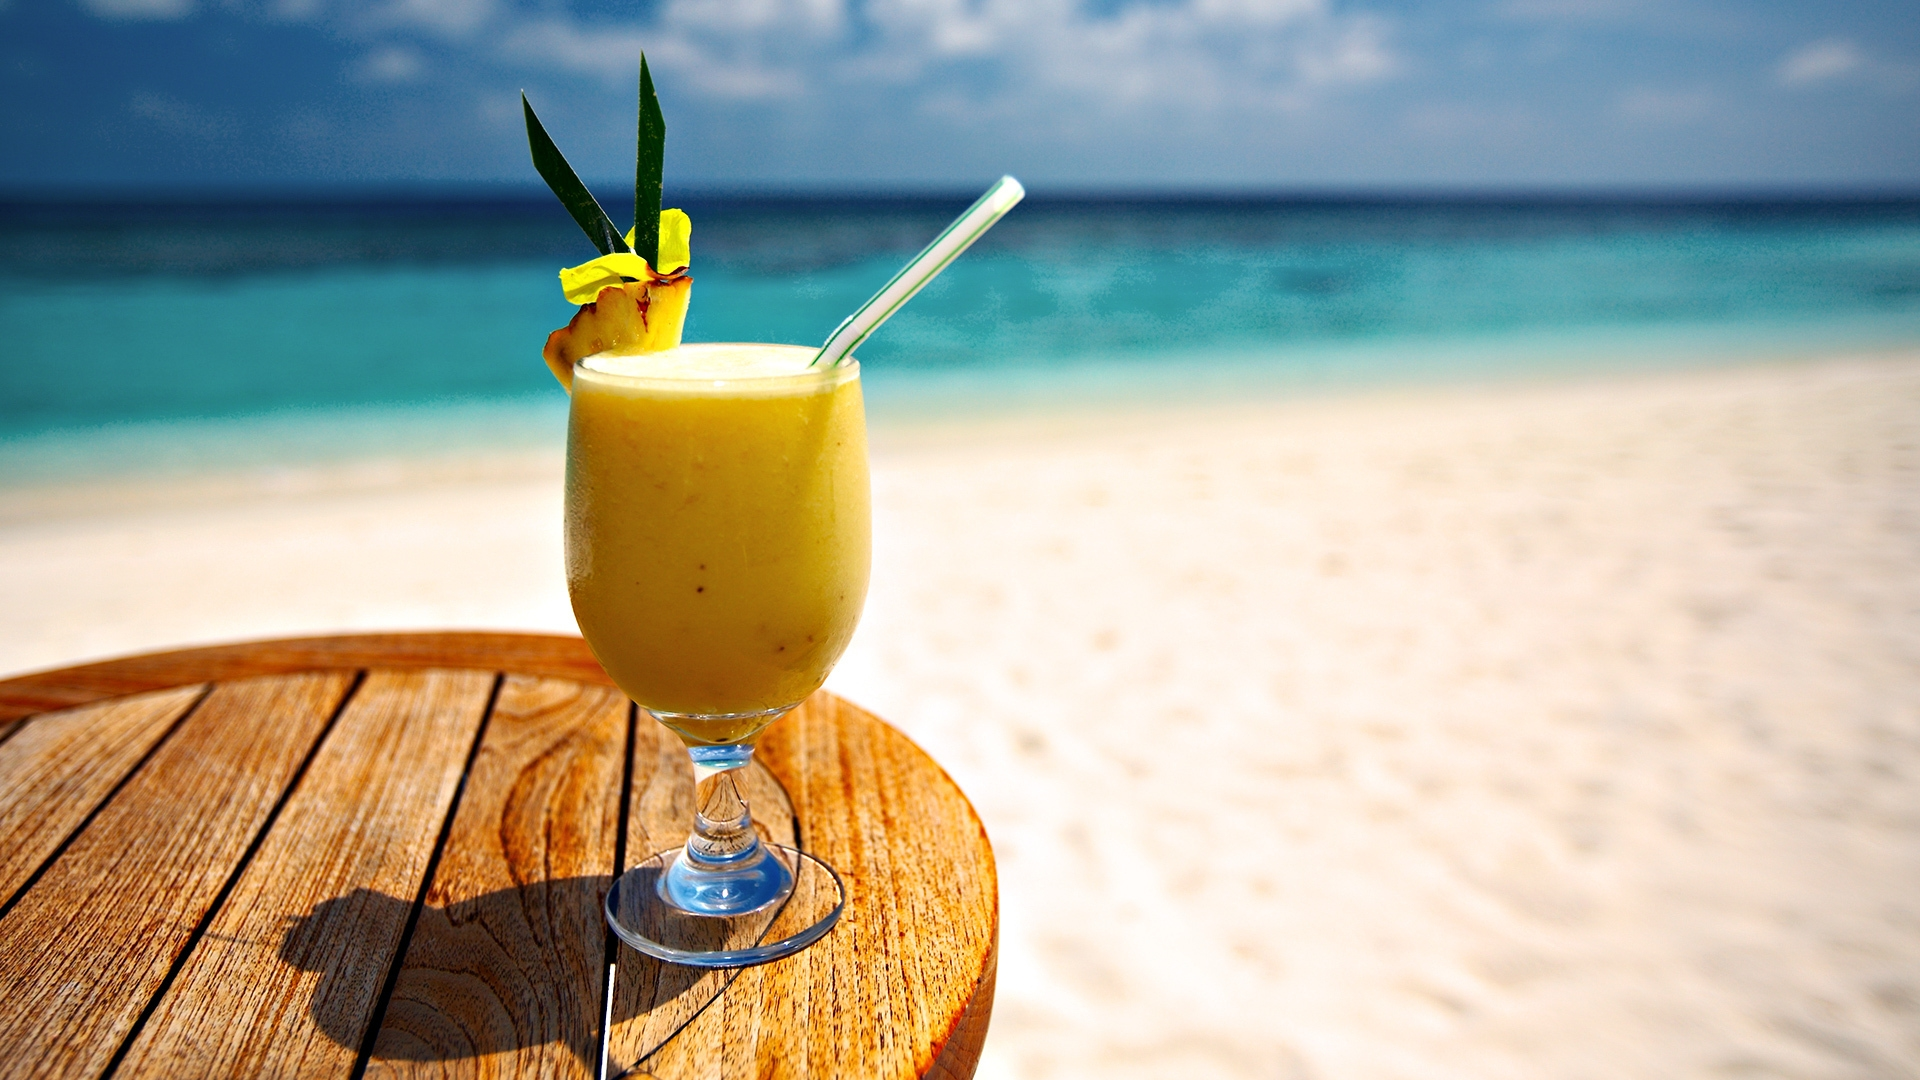 Download Wallpaper 1920x1080 cocktail, beach, pineapple, decor ... for Pineapple Wallpaper Beach  54lyp